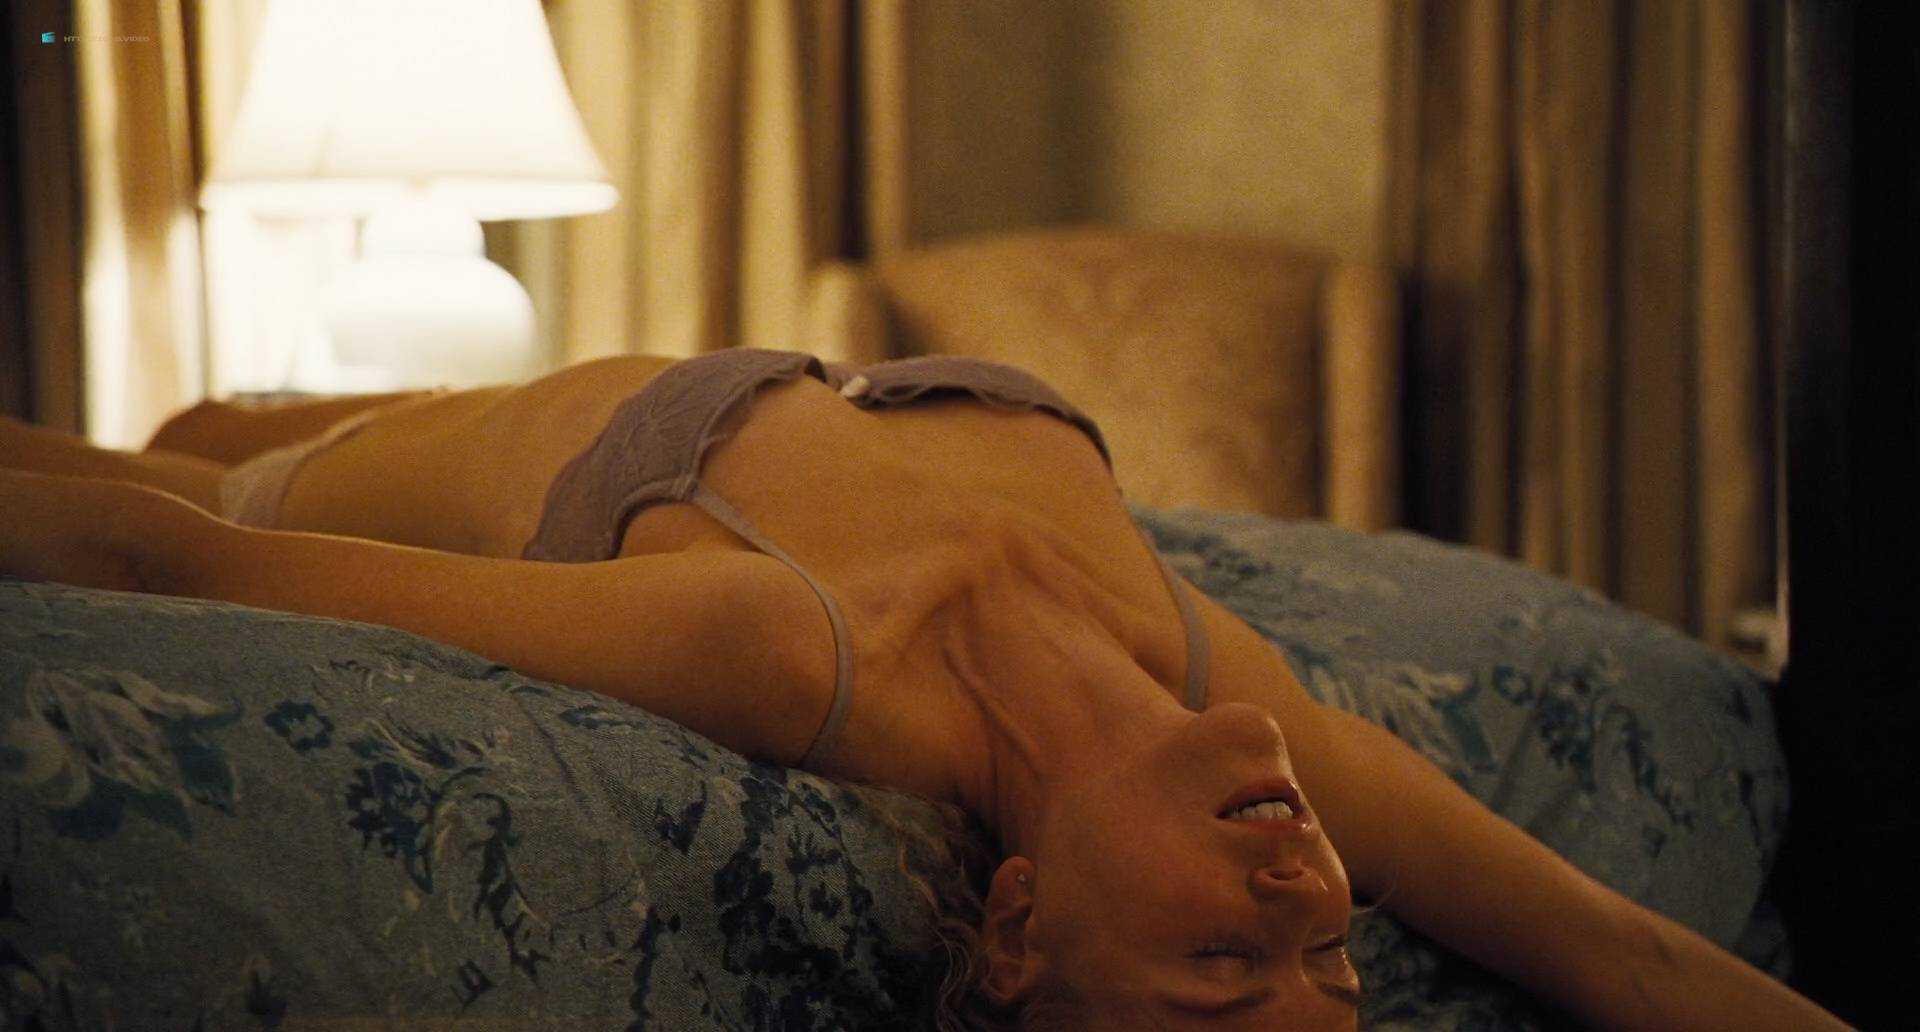 Nicole-Kidman-nude-bush-and-boobs-The-Killing-of-a-Sacred-Deer-2017-HD-1080p-06.jpg